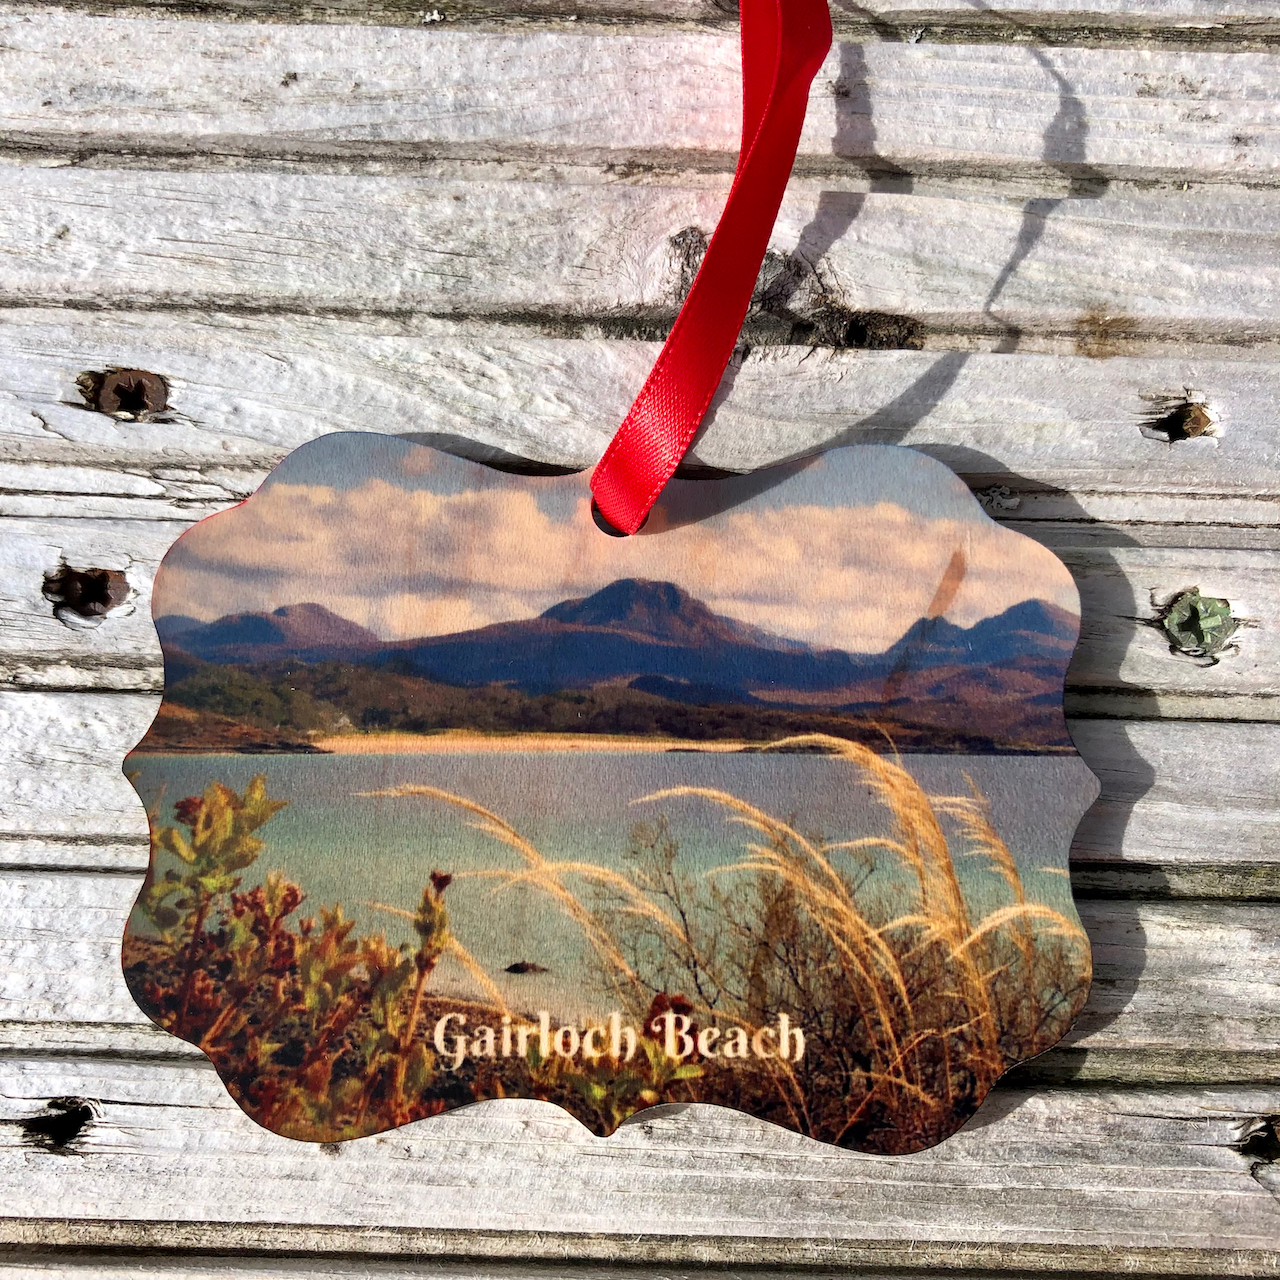 Xmas: Wooden Ornament Gairloch